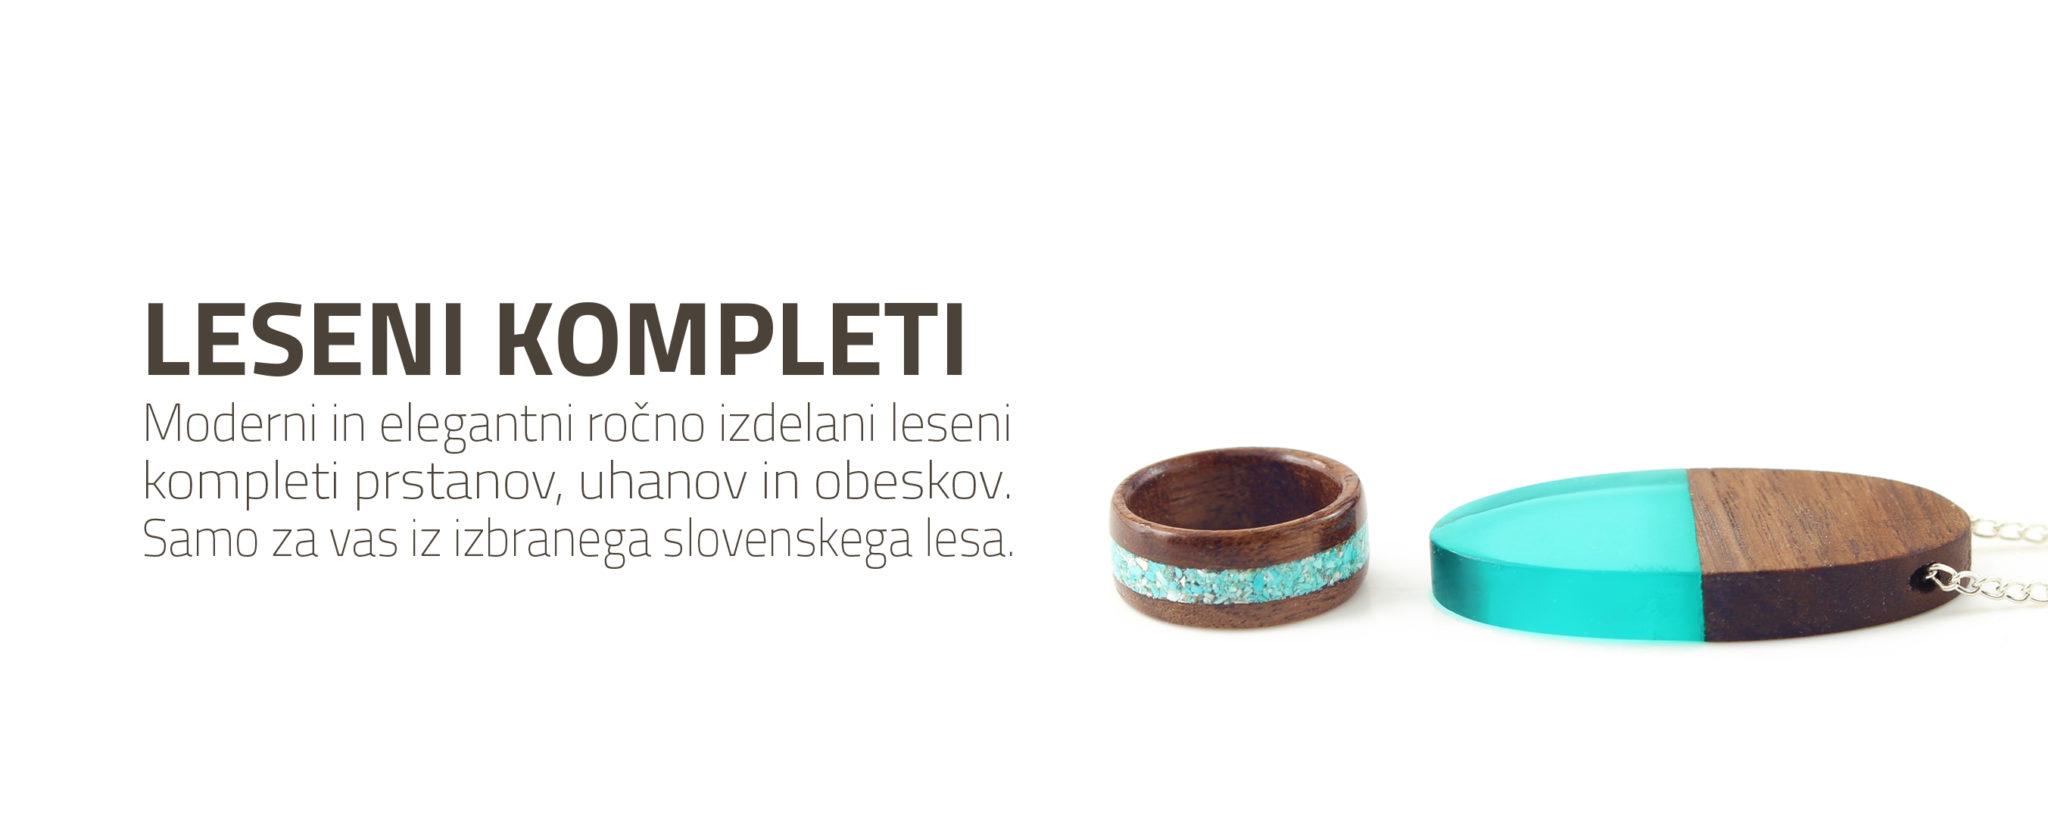 slider_komplet_text_1